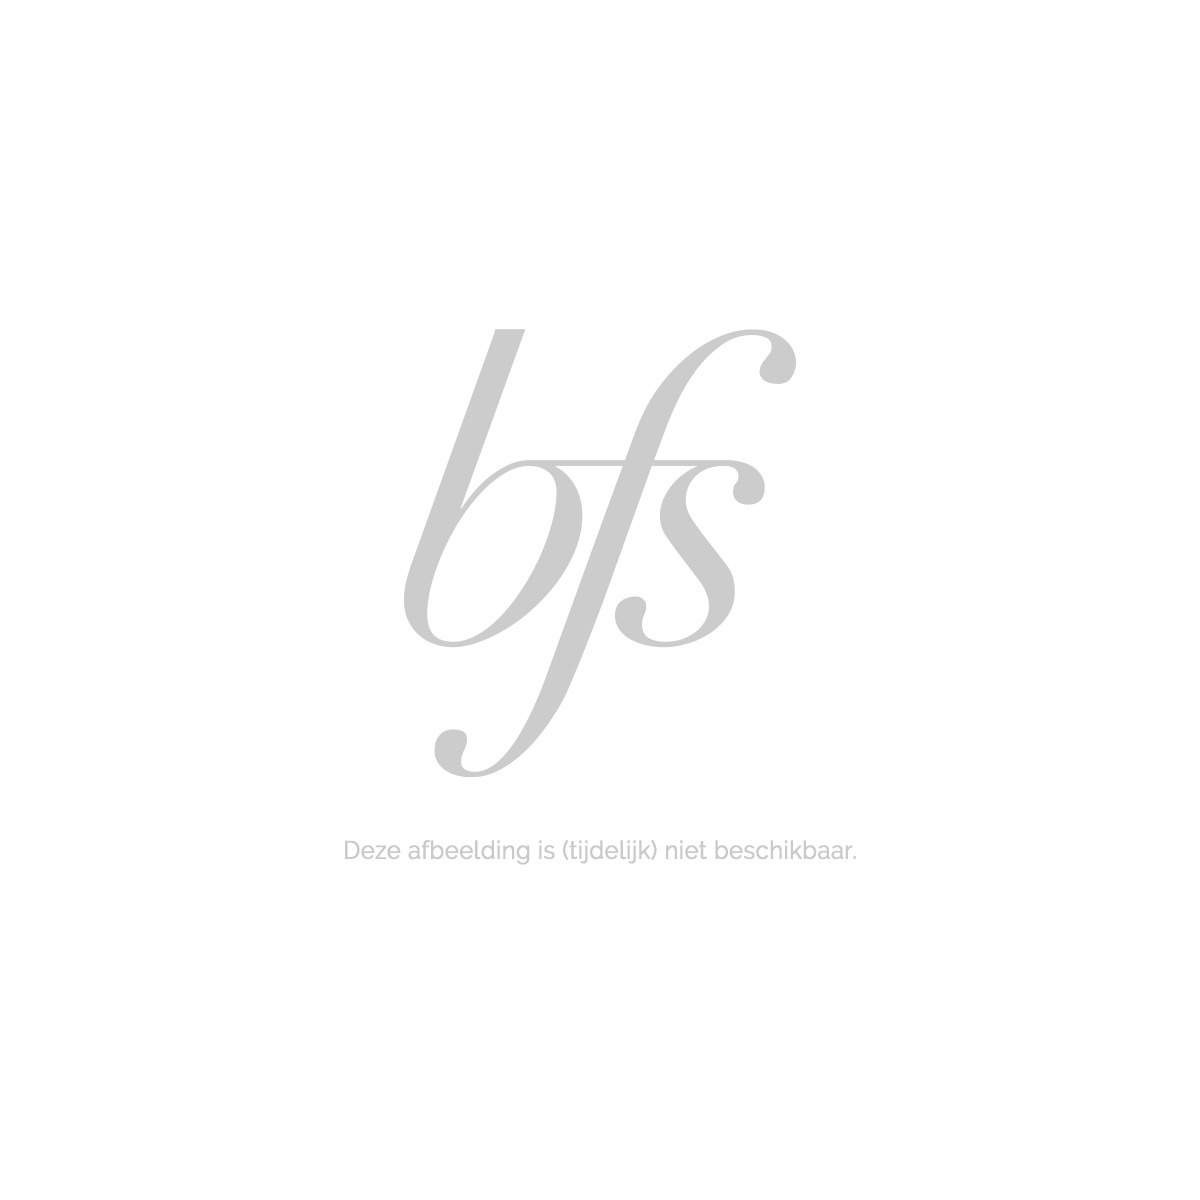 Abbildung von Payot My Payot BB Cream Blur 02 Medium My Payot | Alle Hauttypen Müde Haut Beauty